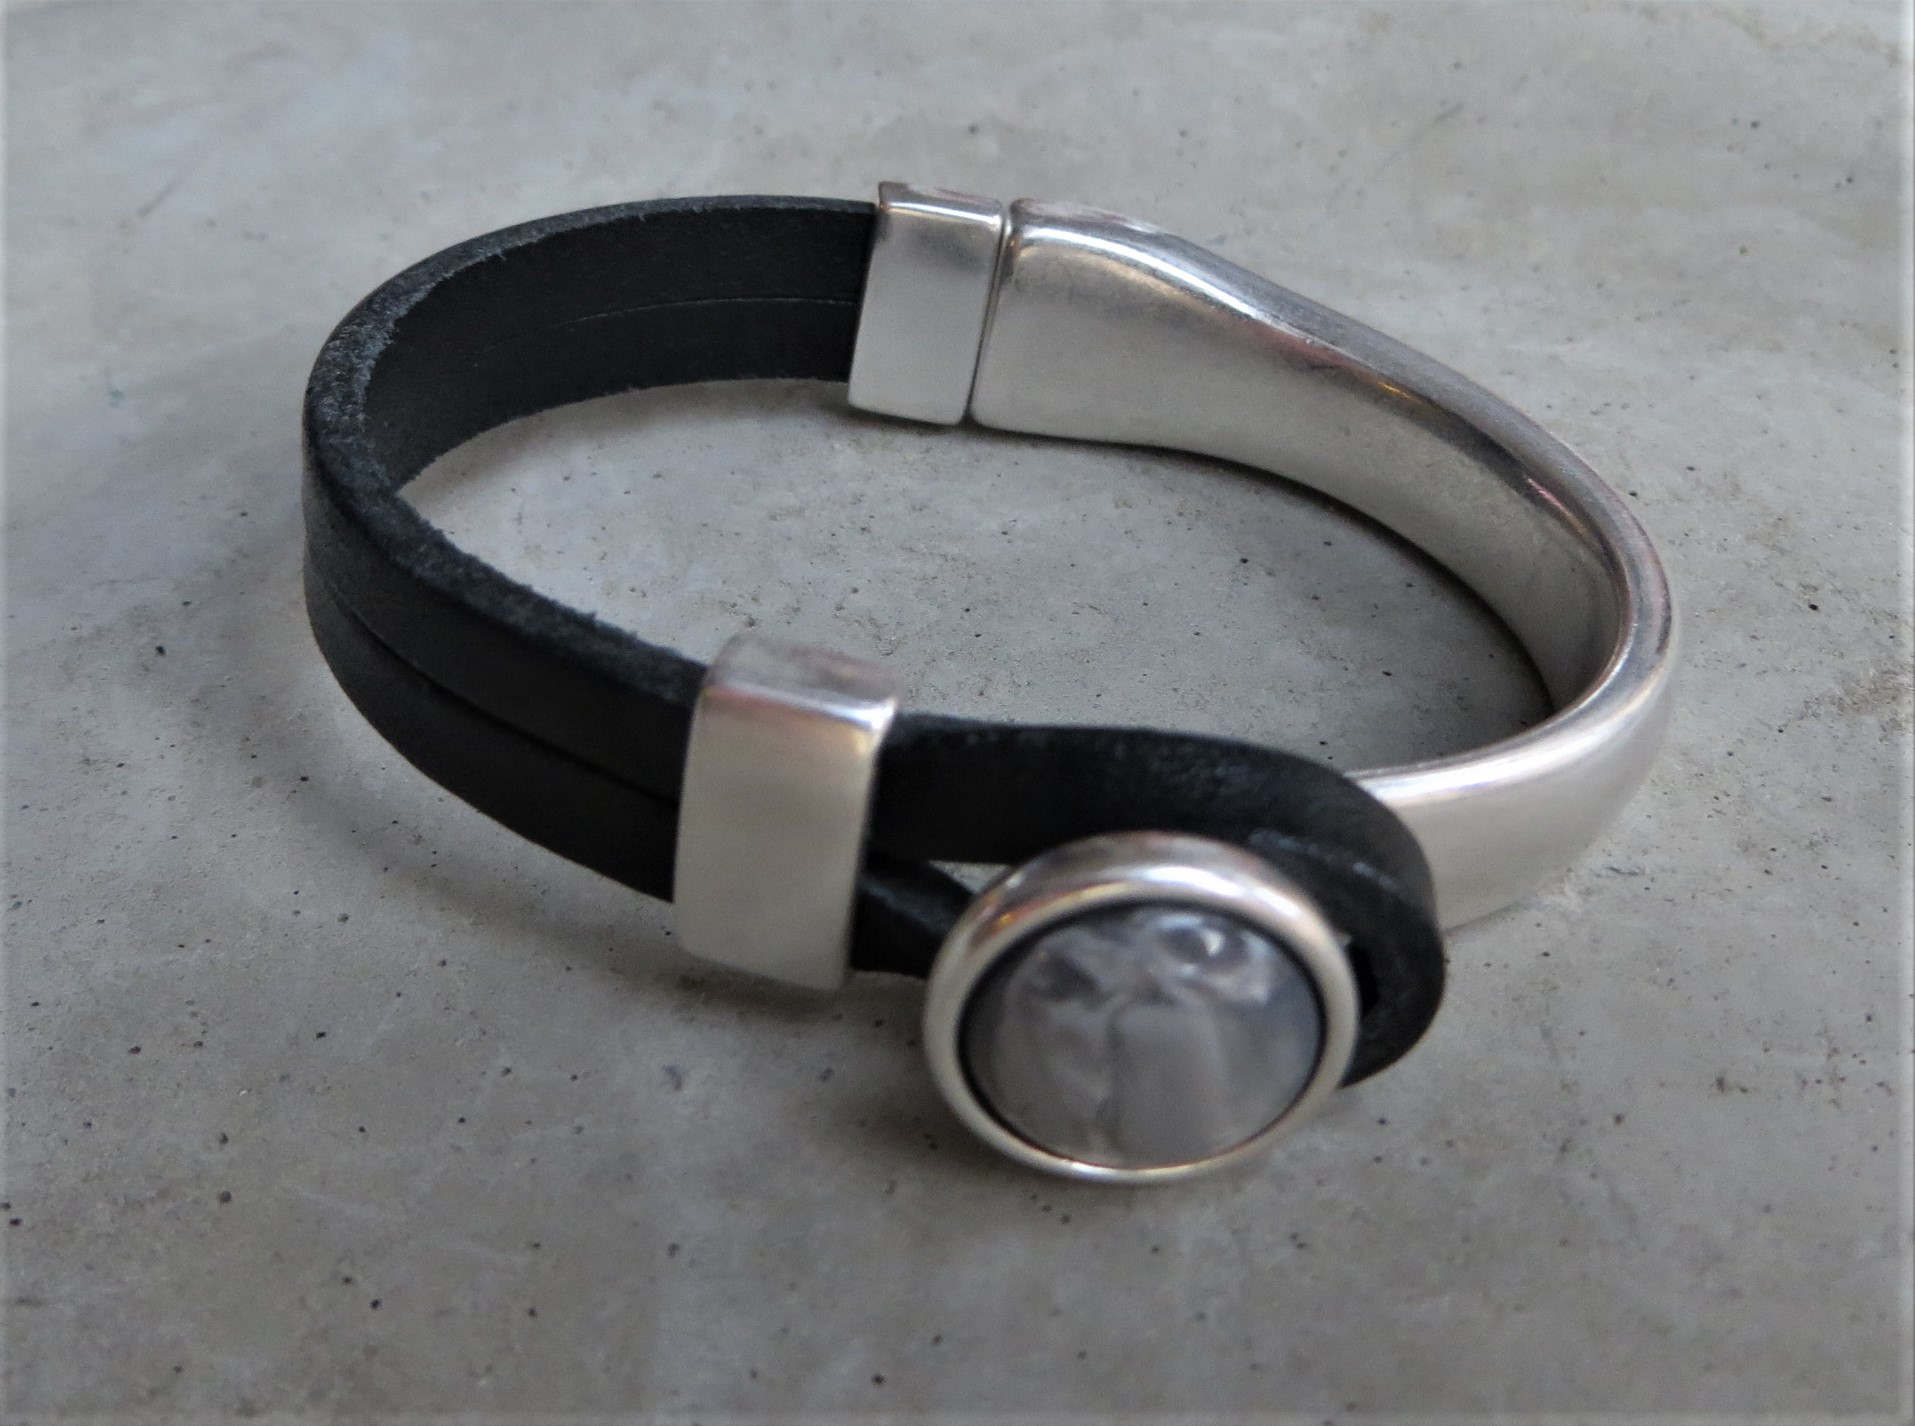 Armbaender - QOSS Armband GWEN Schwarz Grau S  - Onlineshop Tante Emmer